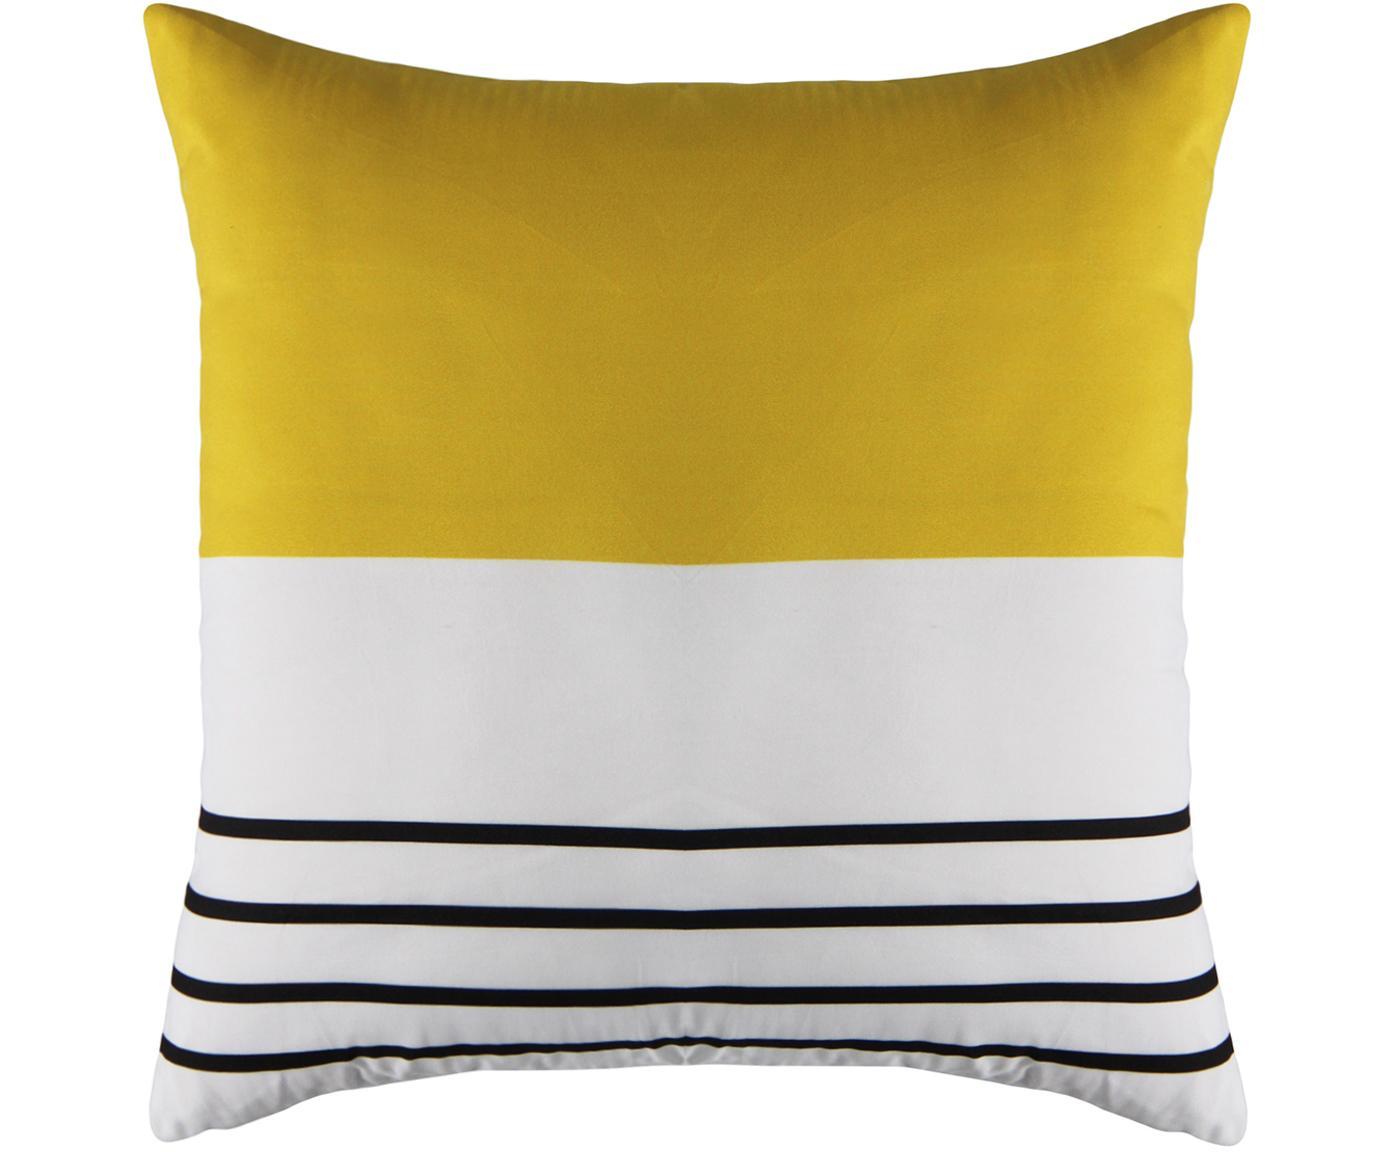 Federa arredo a righe Magdalena, Poliestere, Bianco, giallo, nero, Larg. 40 x Lung. 40 cm